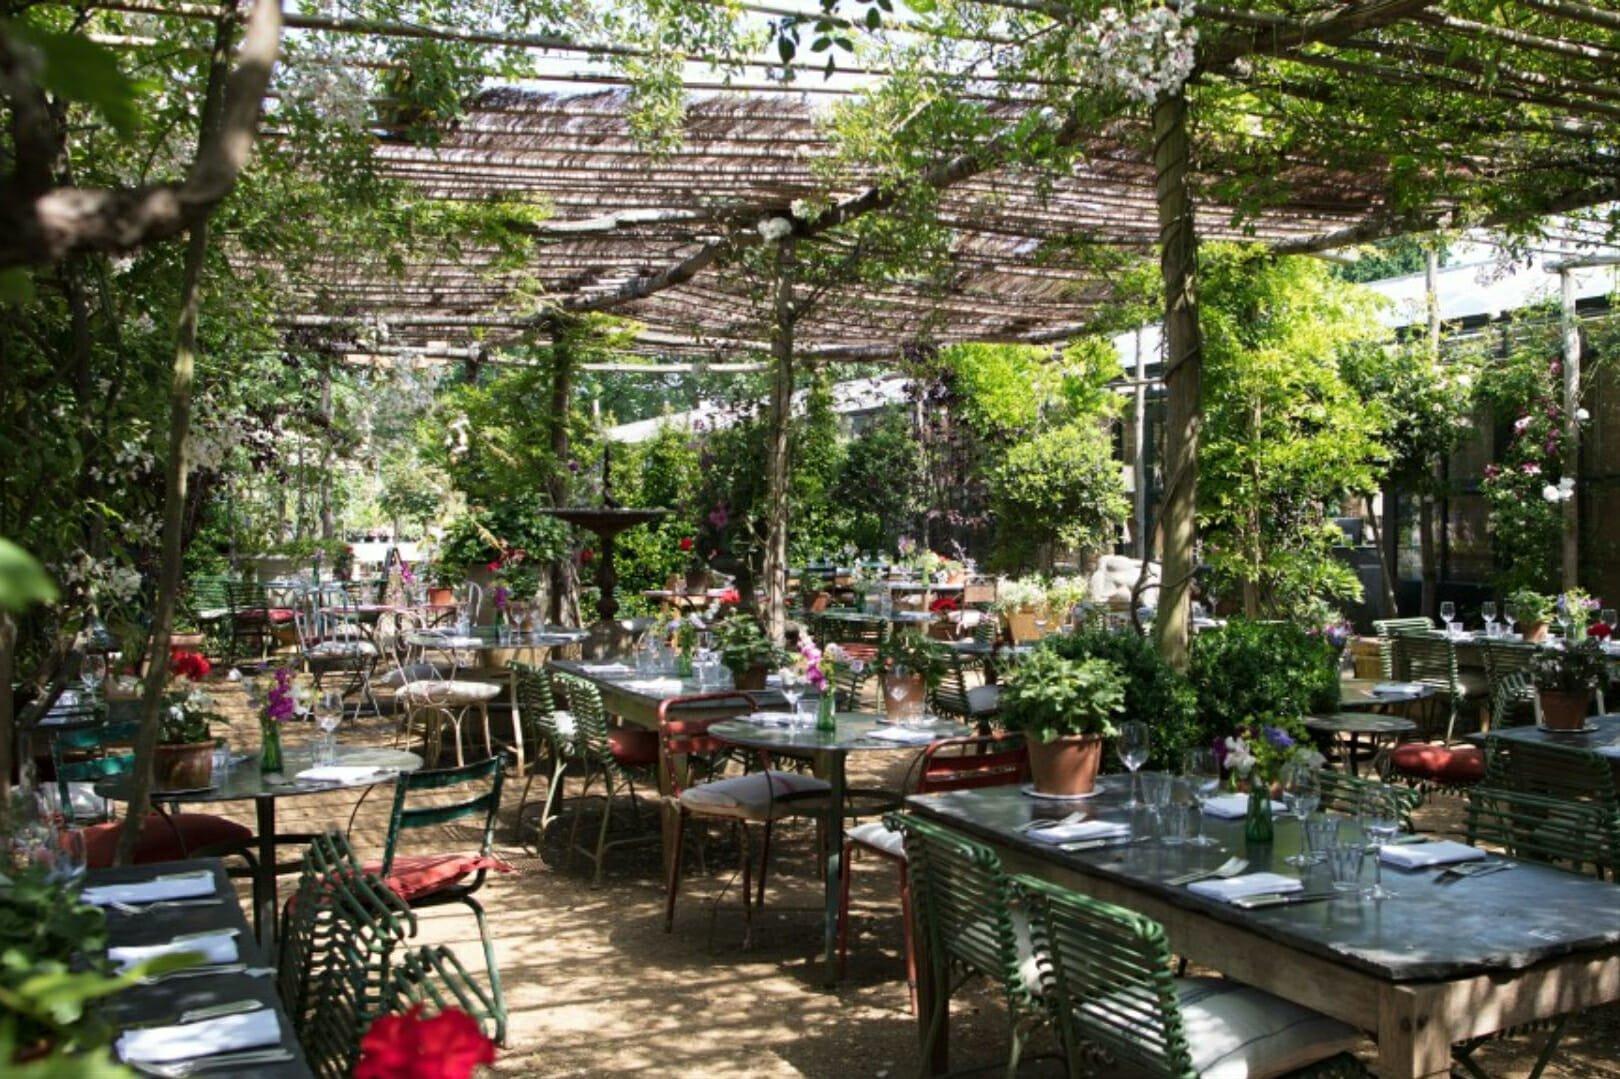 Romantic restaurants: Petersham Nurseries